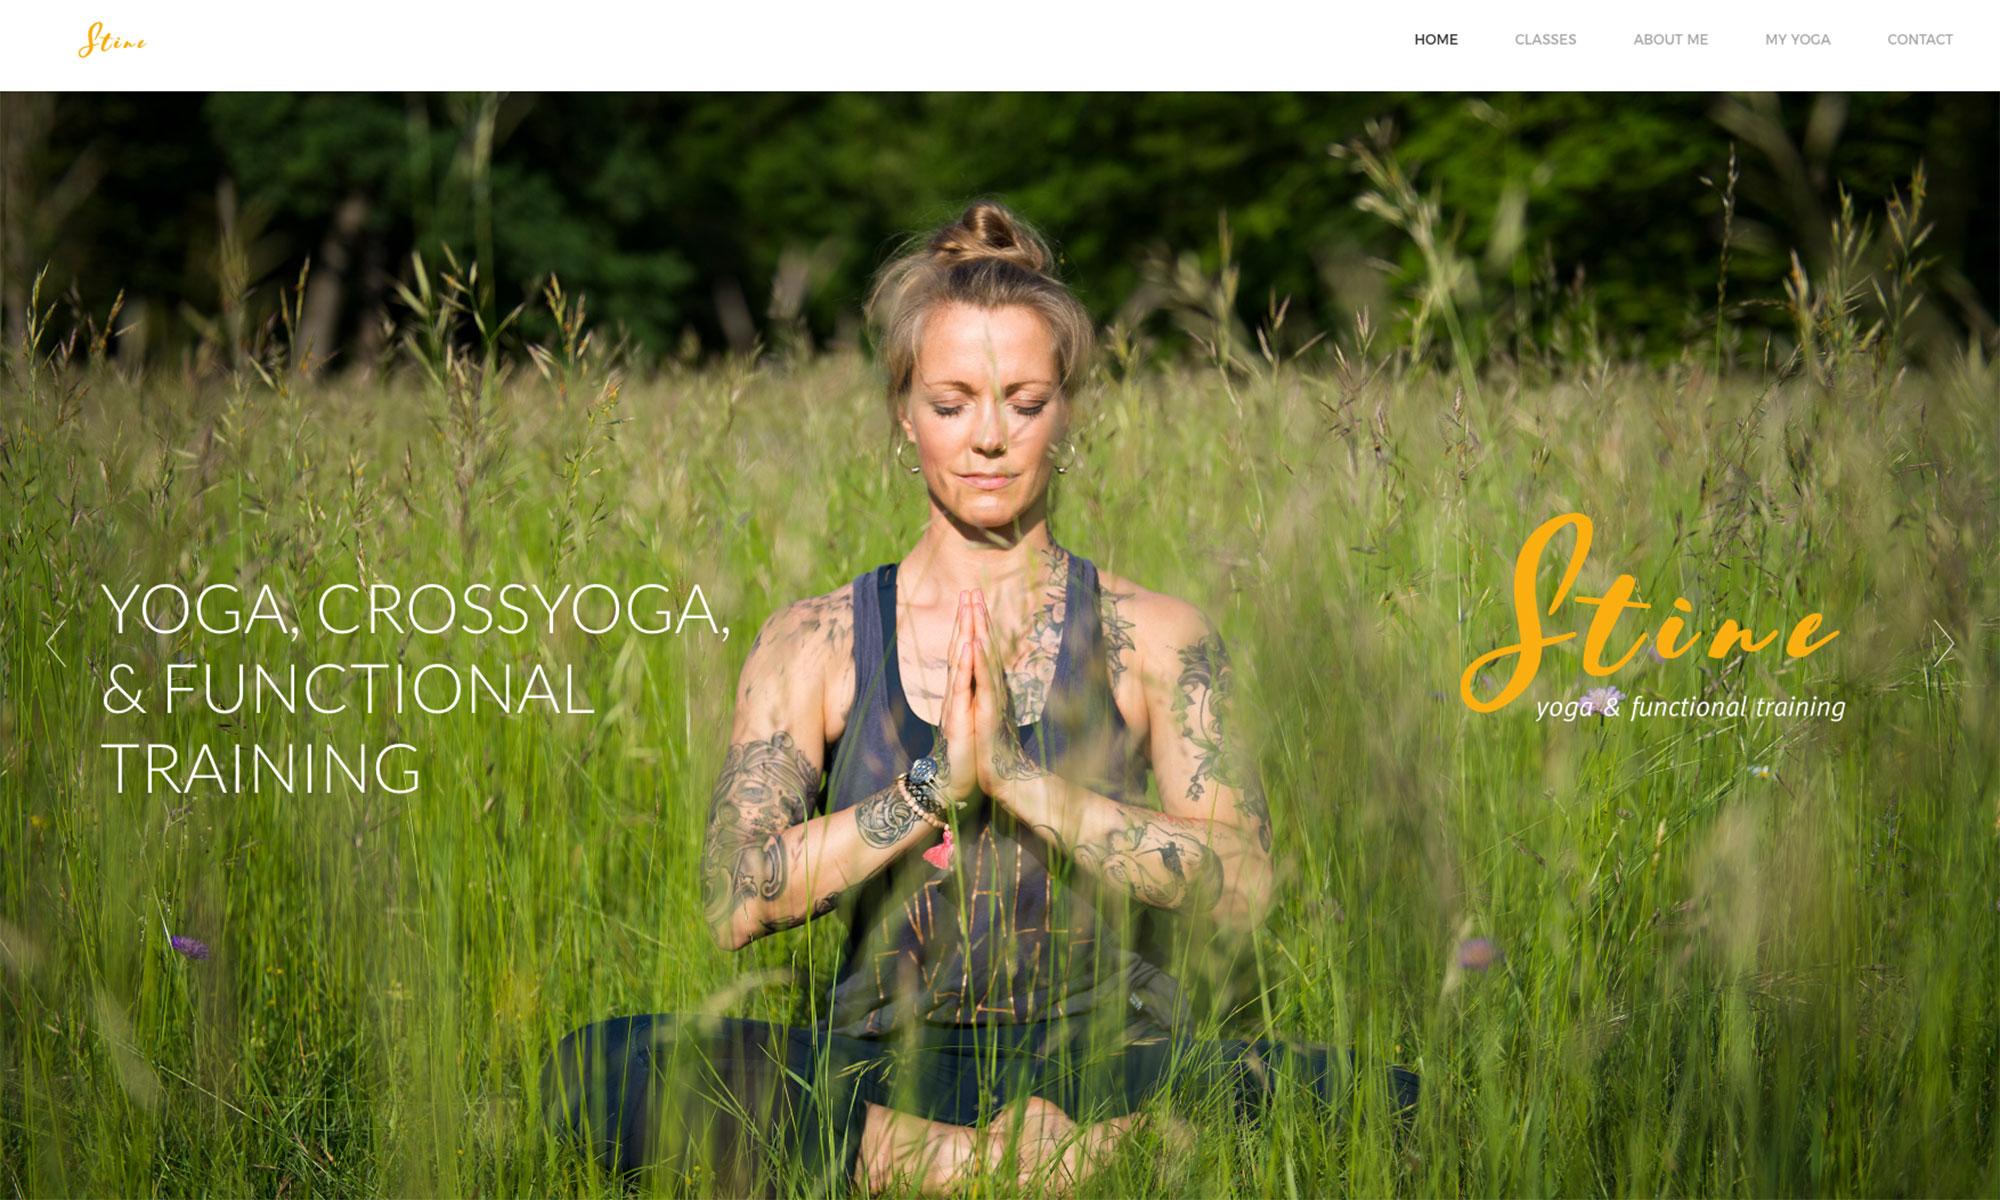 Webdesign München Yoga